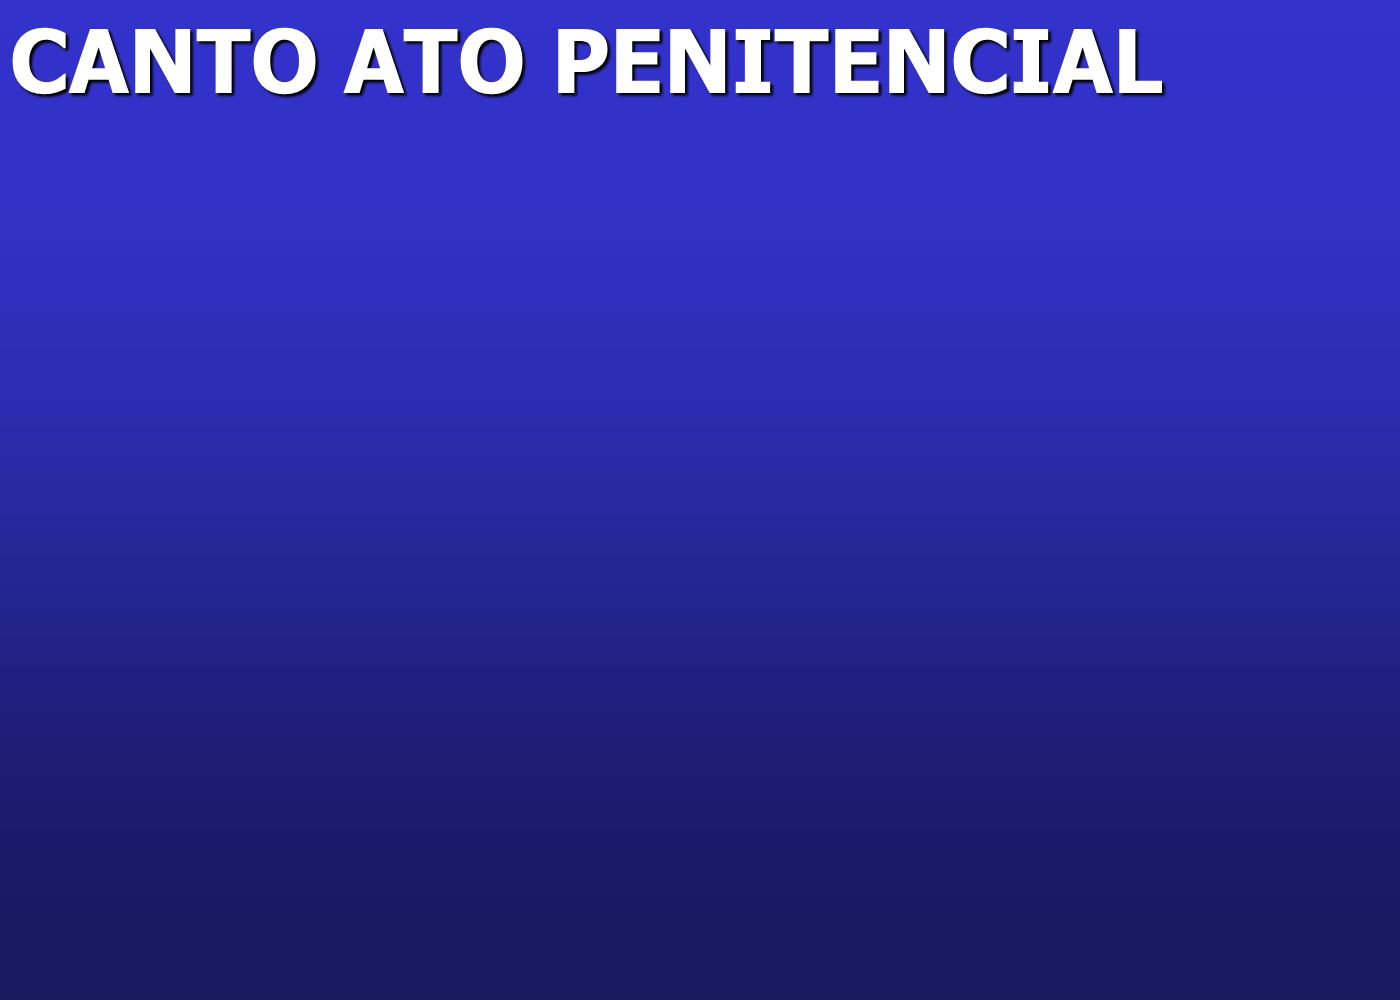 CANTO ATO PENITENCIAL